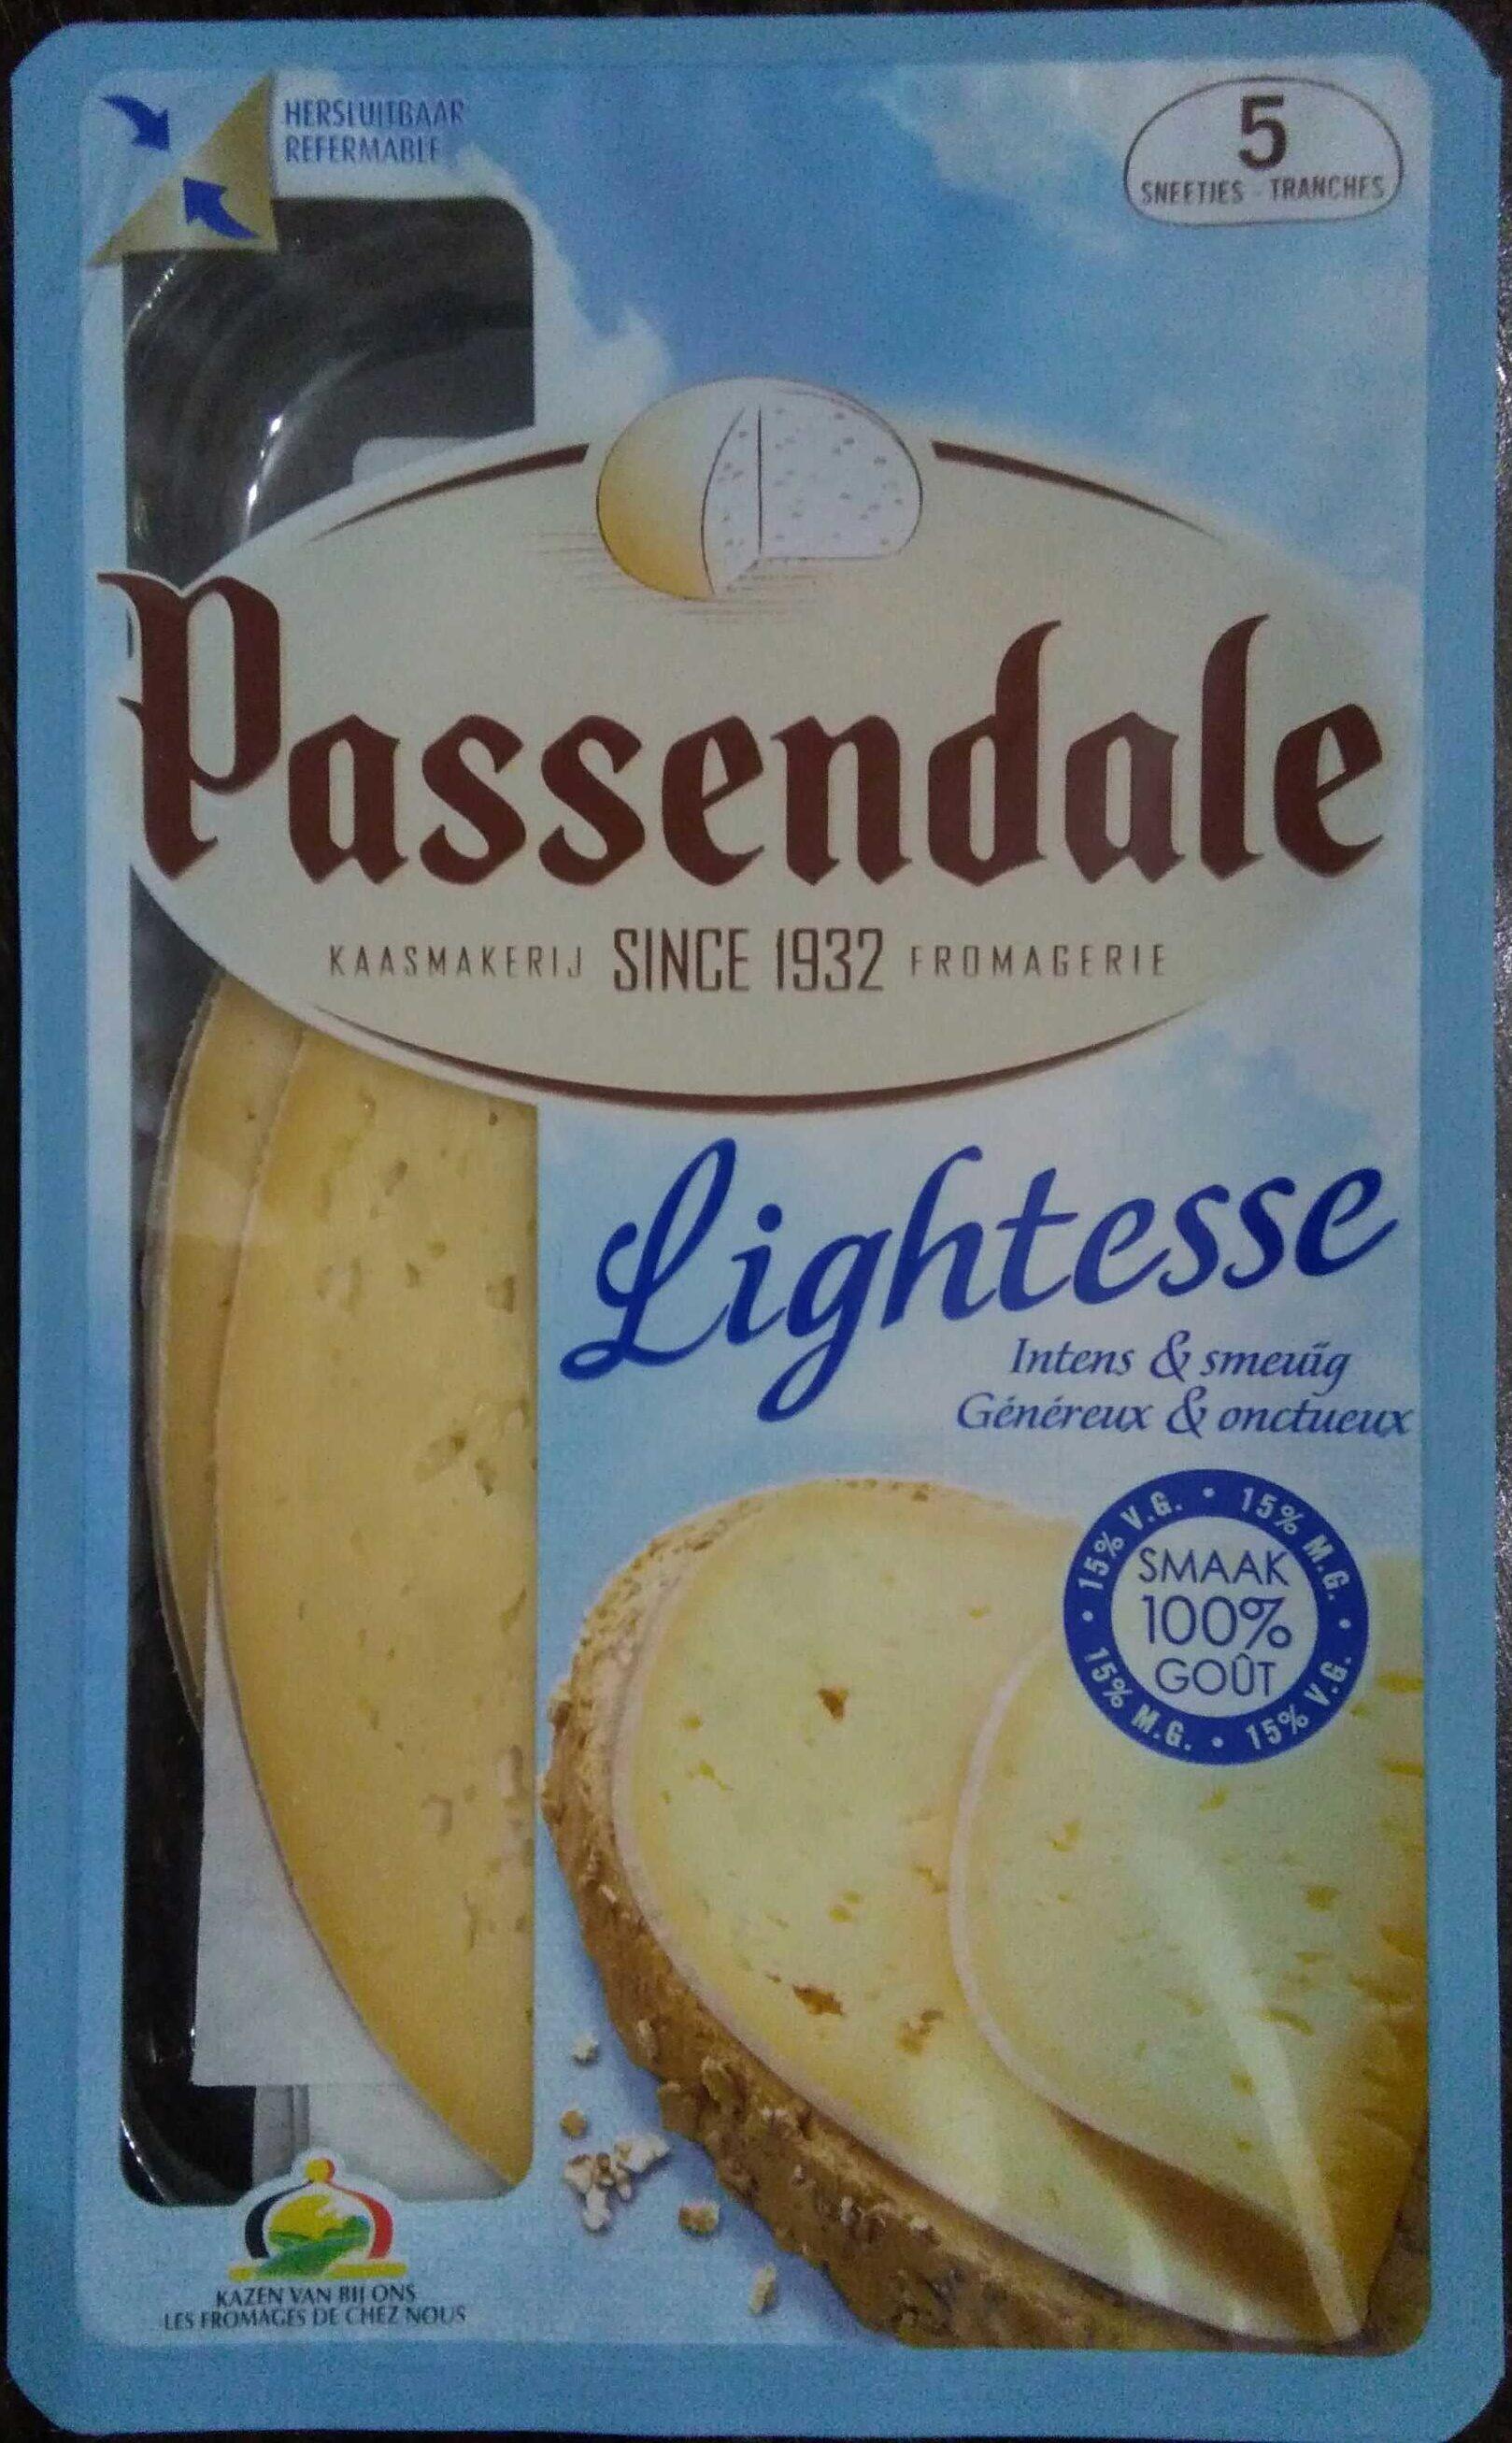 Passendale lightesse - Product - fr